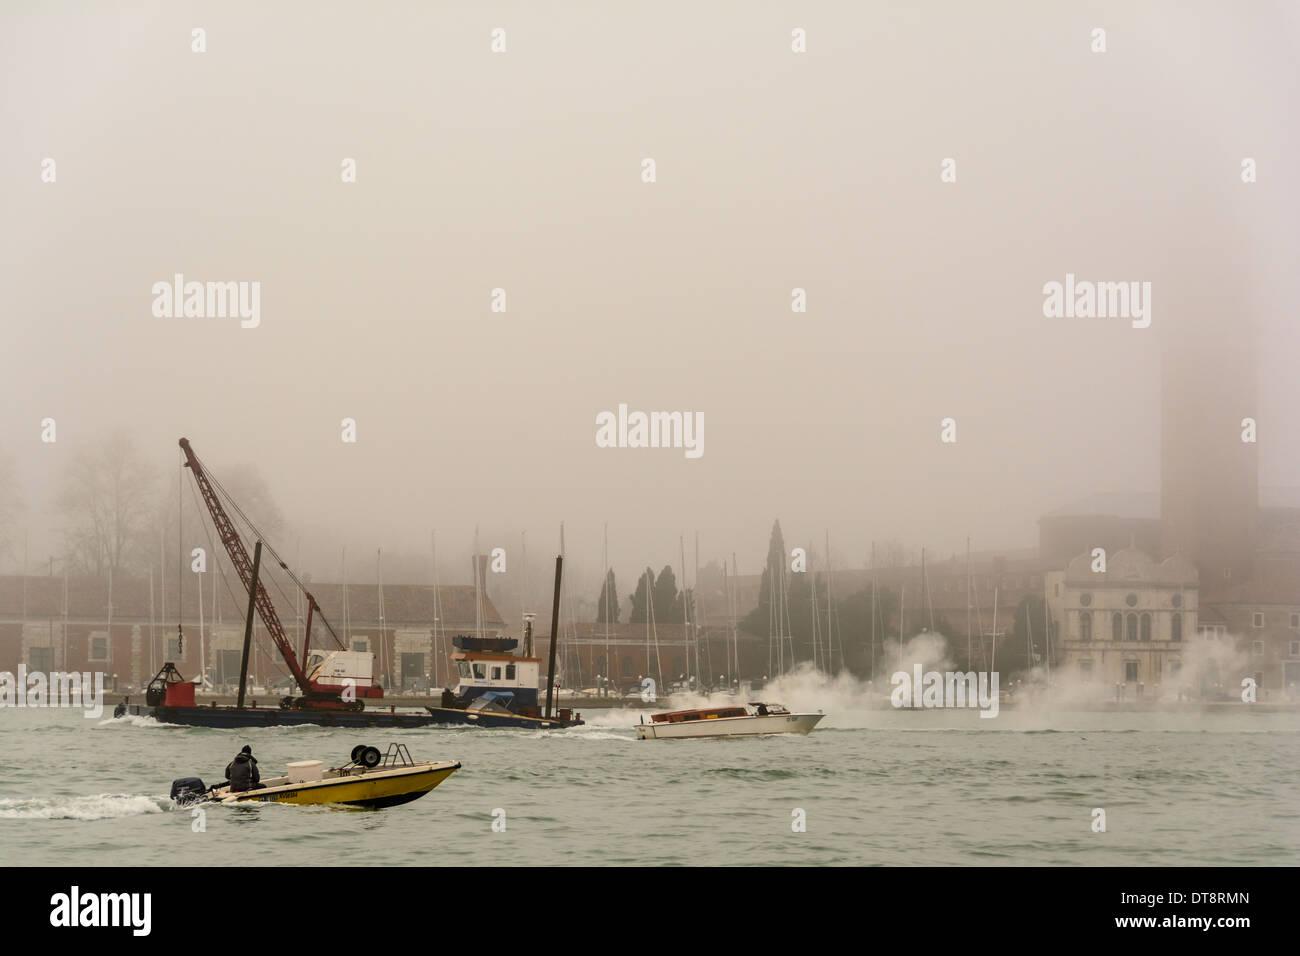 Venice, Italy. San Giorgio Maggiore island Campanile belltower covered in fog, boats and water traffic. Stock Photo